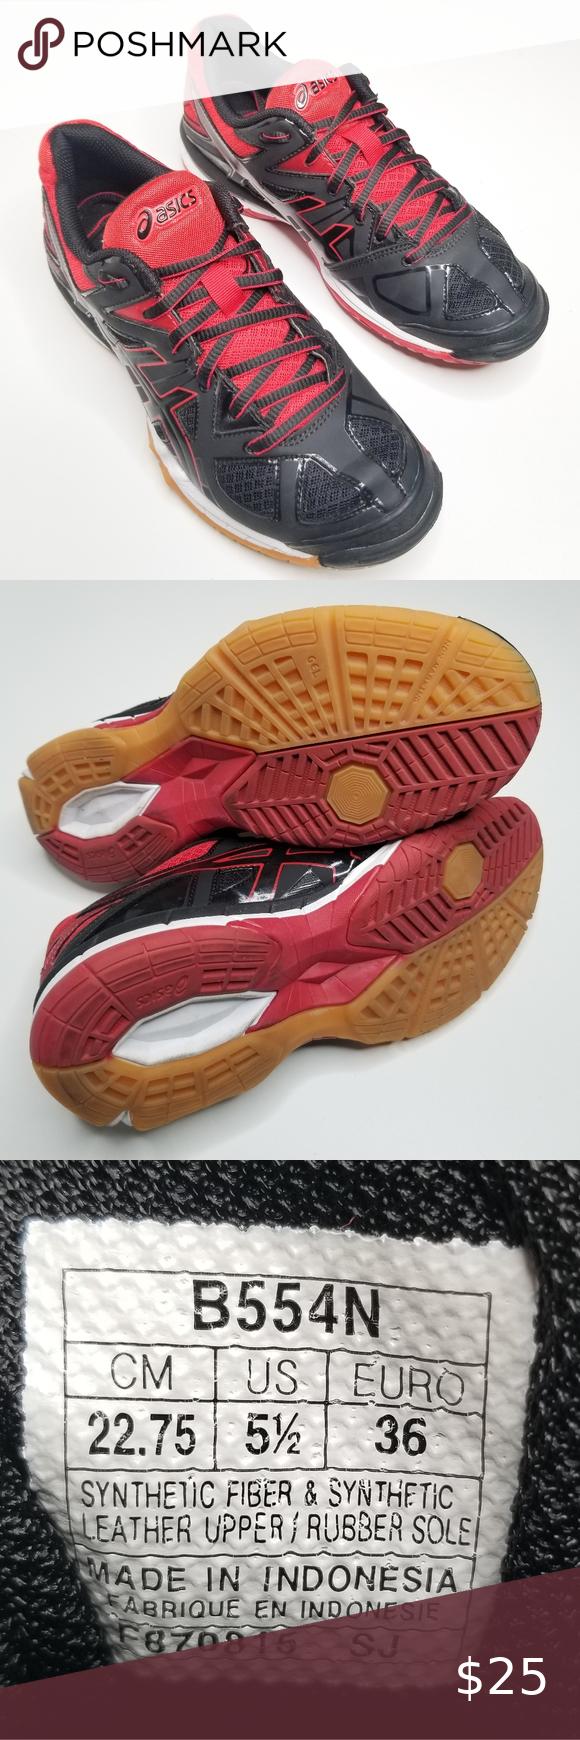 Asics Gel Tactic Volleyball Shoe Women S 5 5 In 2020 Asics Women Volleyball Shoes Women Shoes